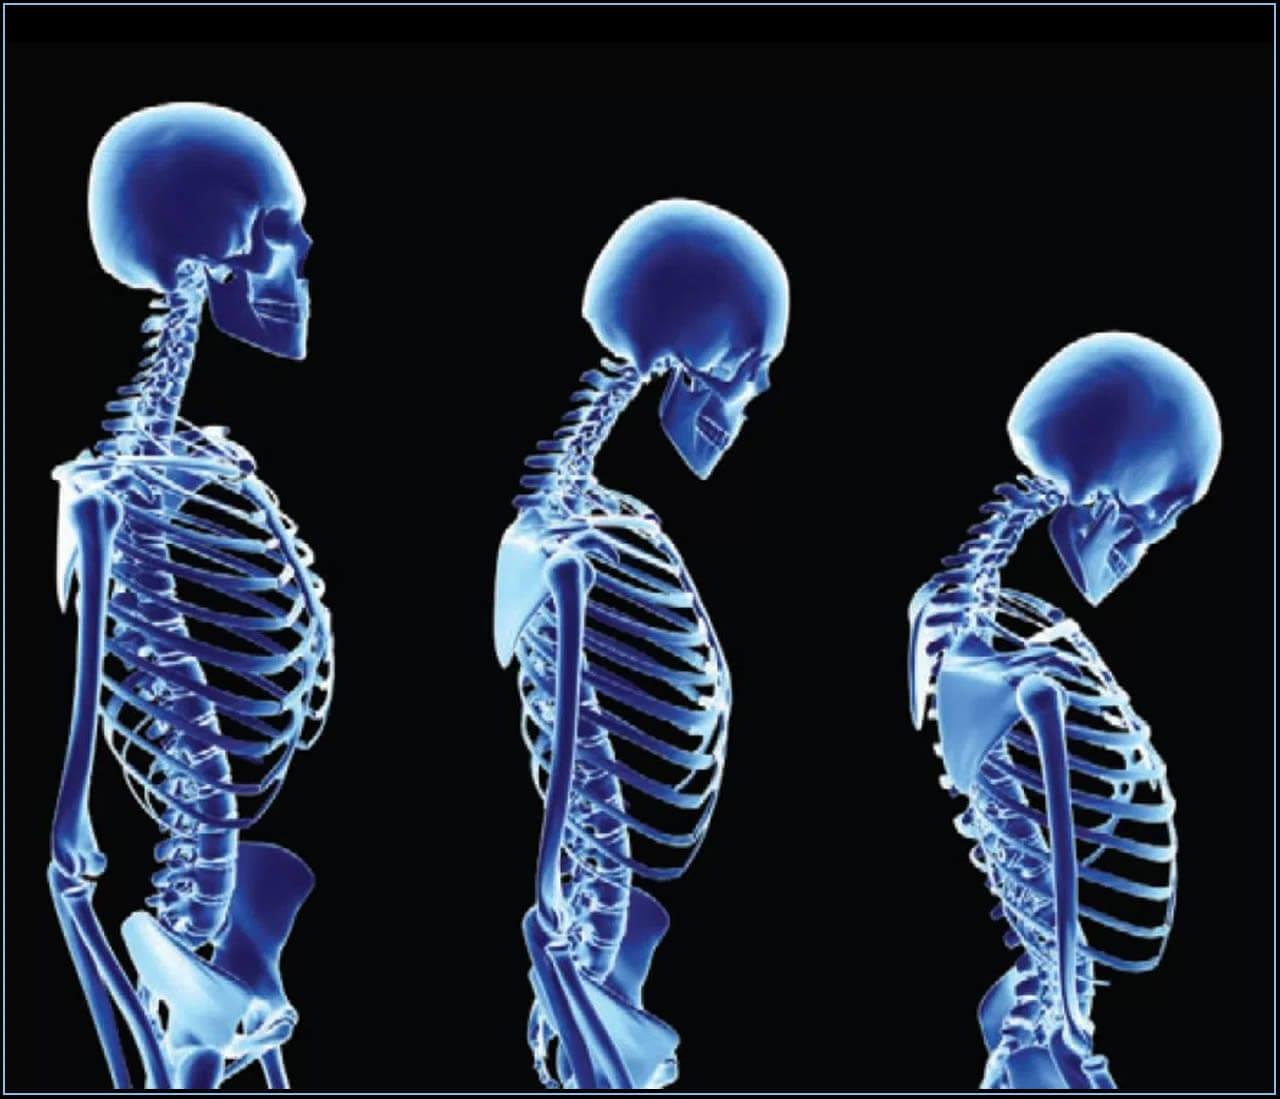 Populares artrite na coluna vertebral - Vertebrata RY83